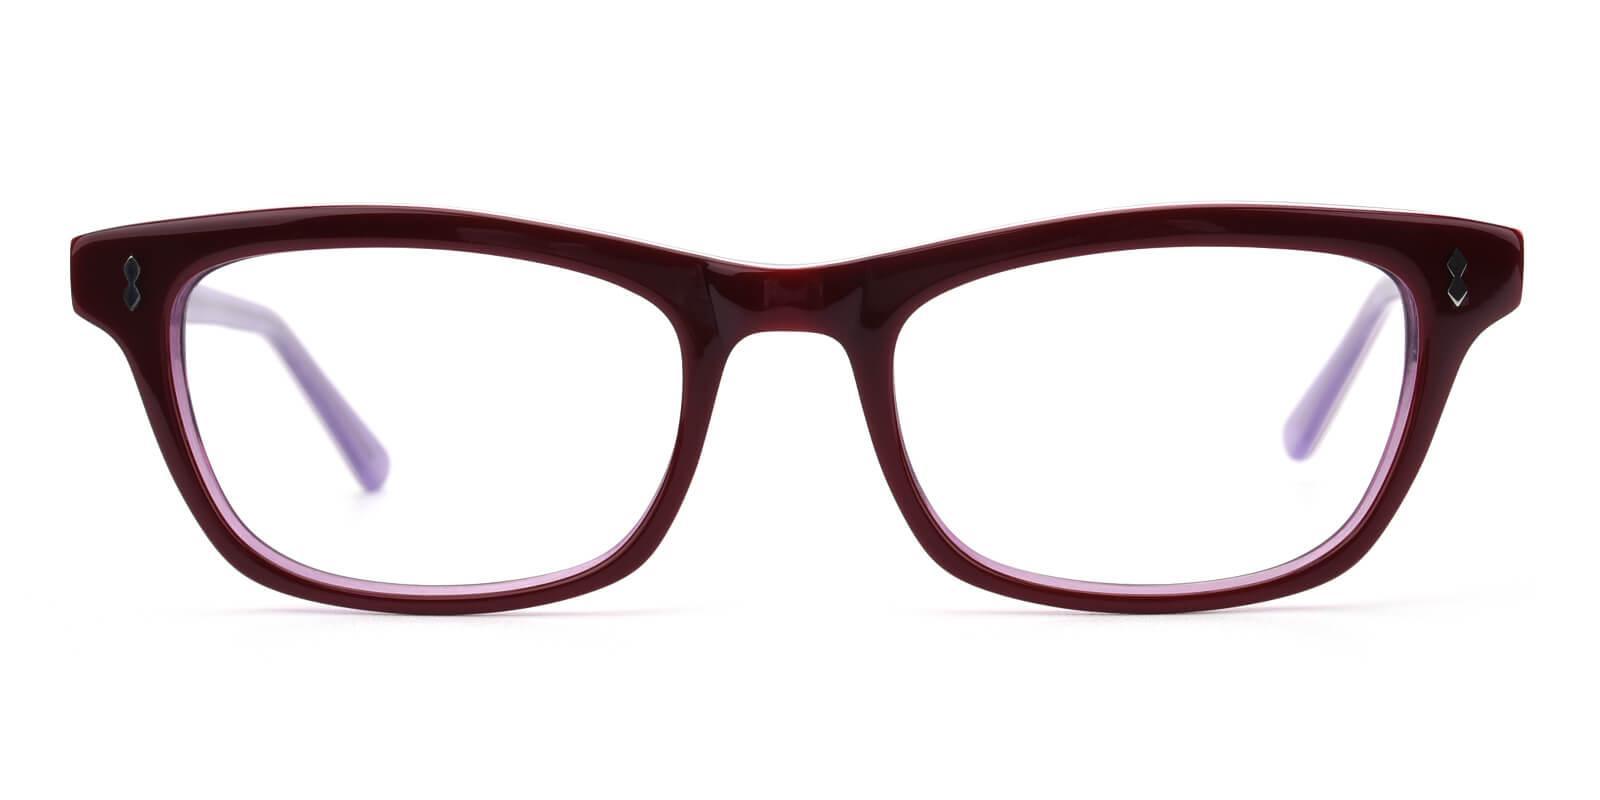 Leavary-Purple-Rectangle-Acetate-Eyeglasses-additional2